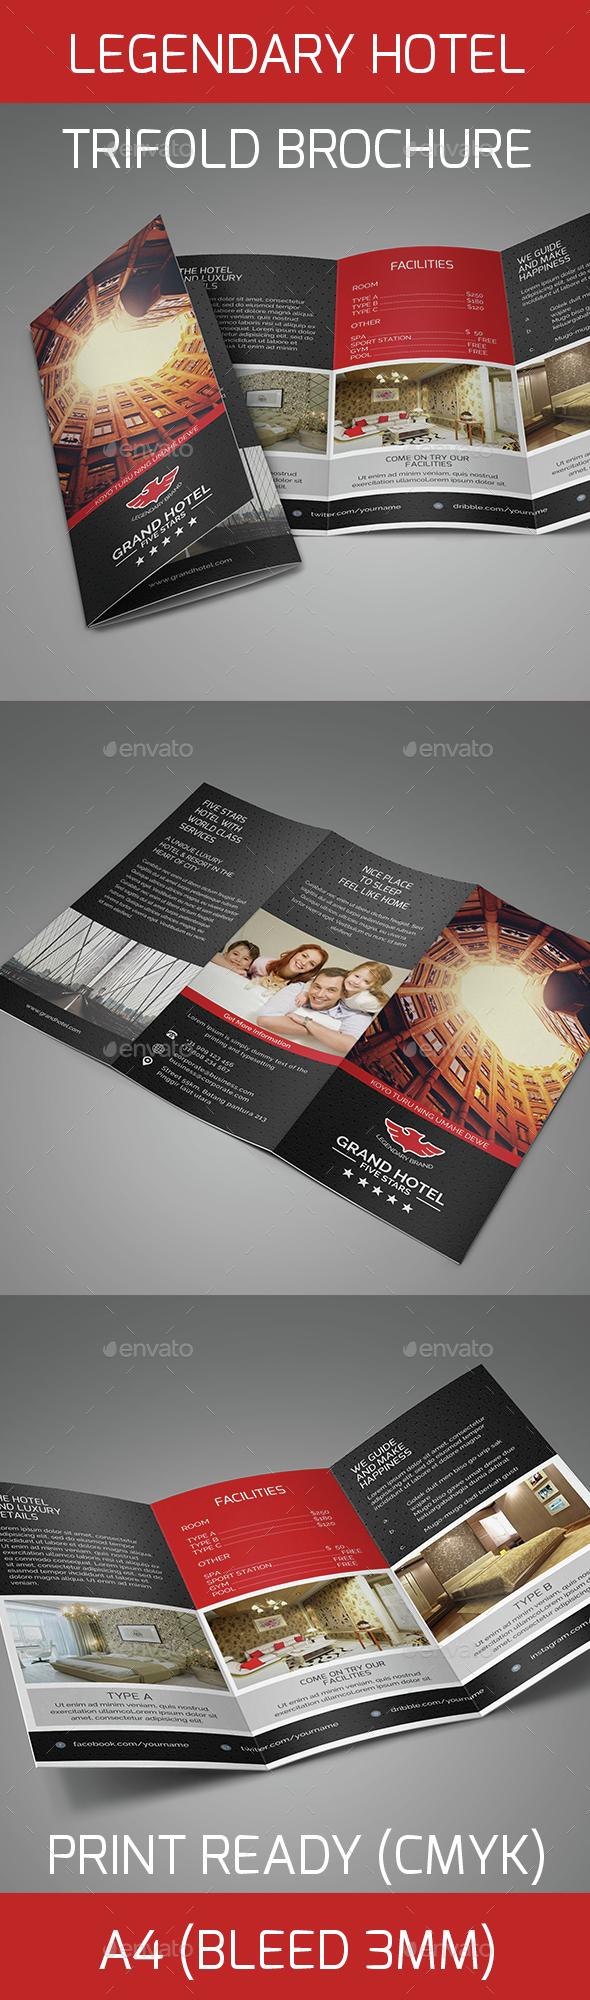 Legendary Hotel Trifold Brochure - Informational Brochures